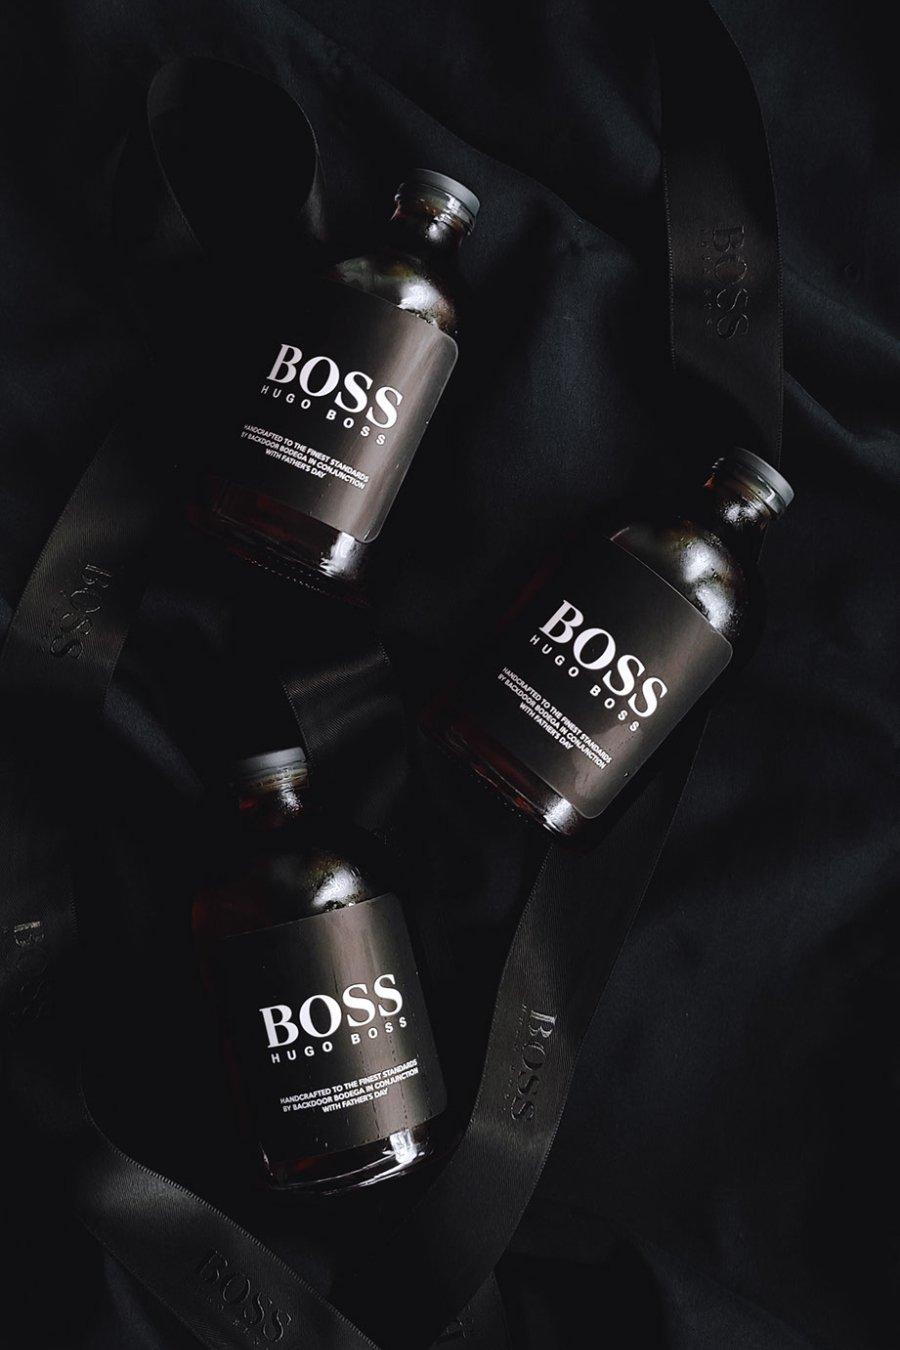 Image of BOSS x Backdoor Bodega